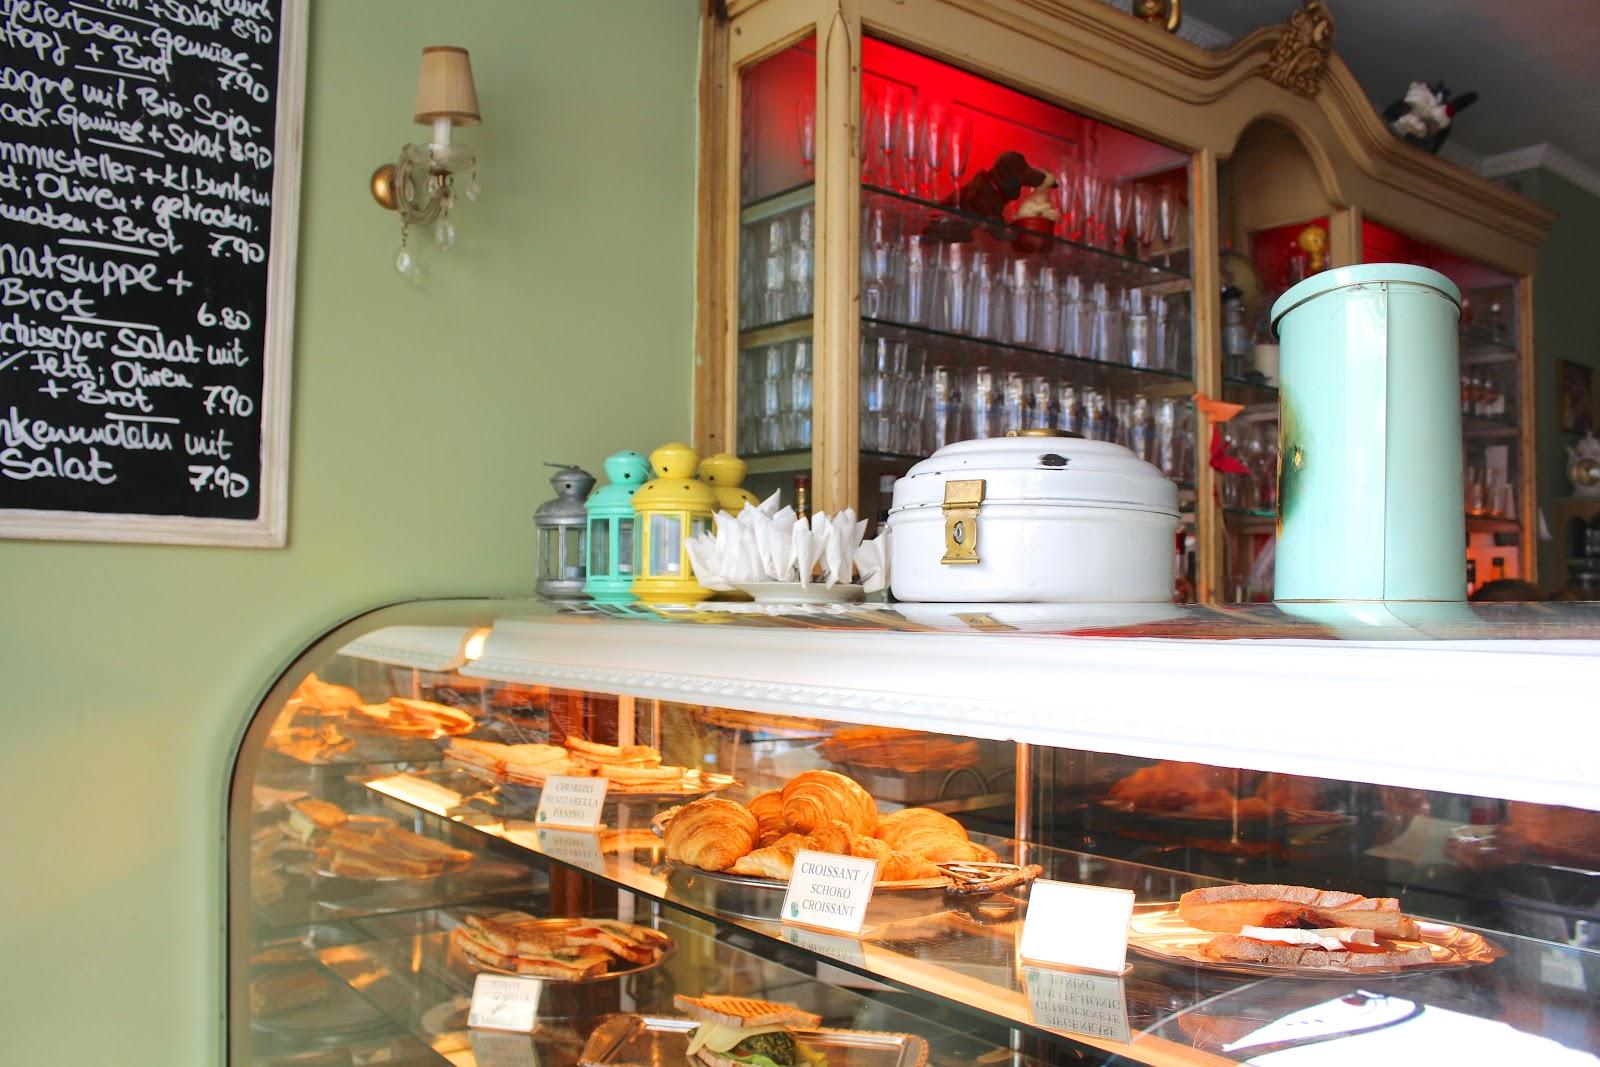 Hoover & Floyd brunch frühstück menu München